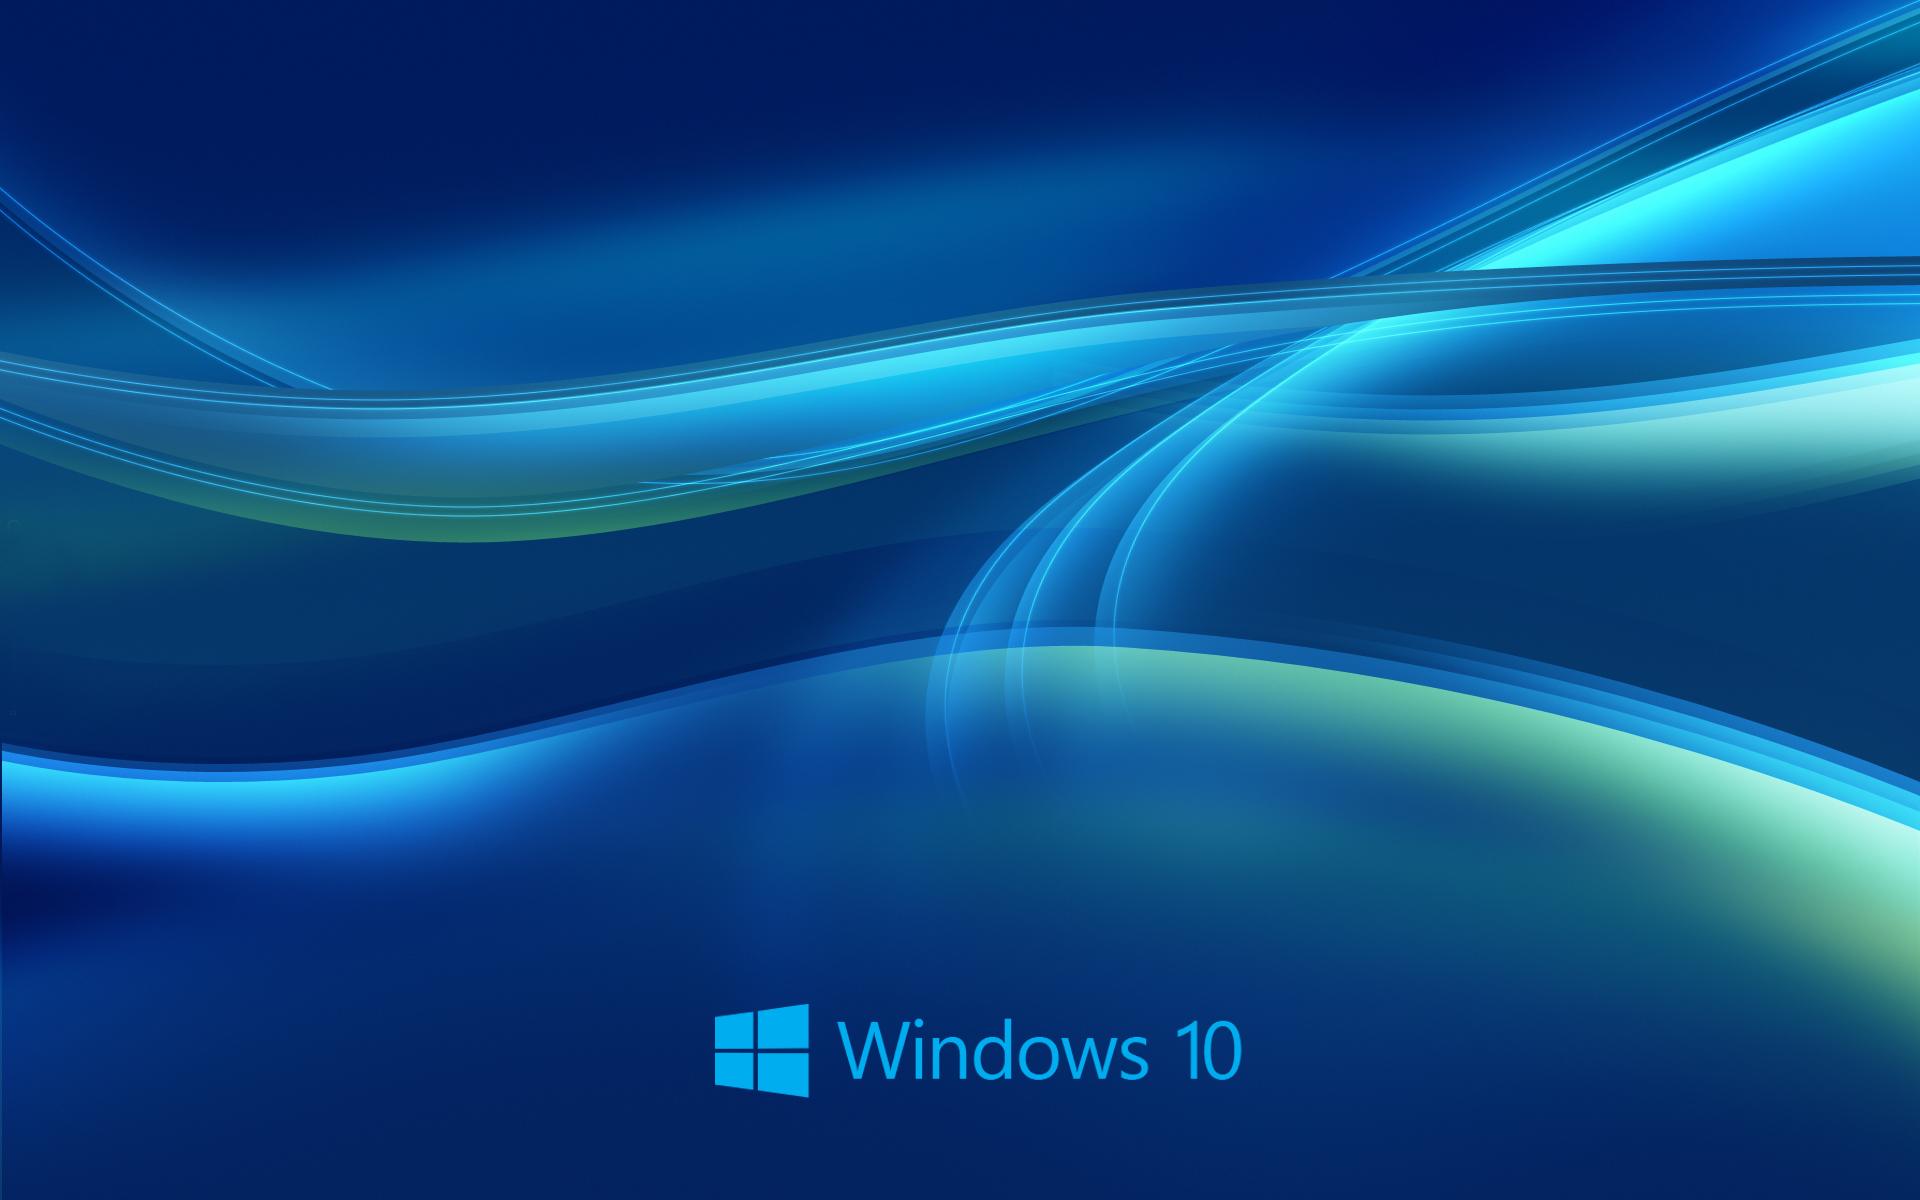 windows 7 full hd wallpaper